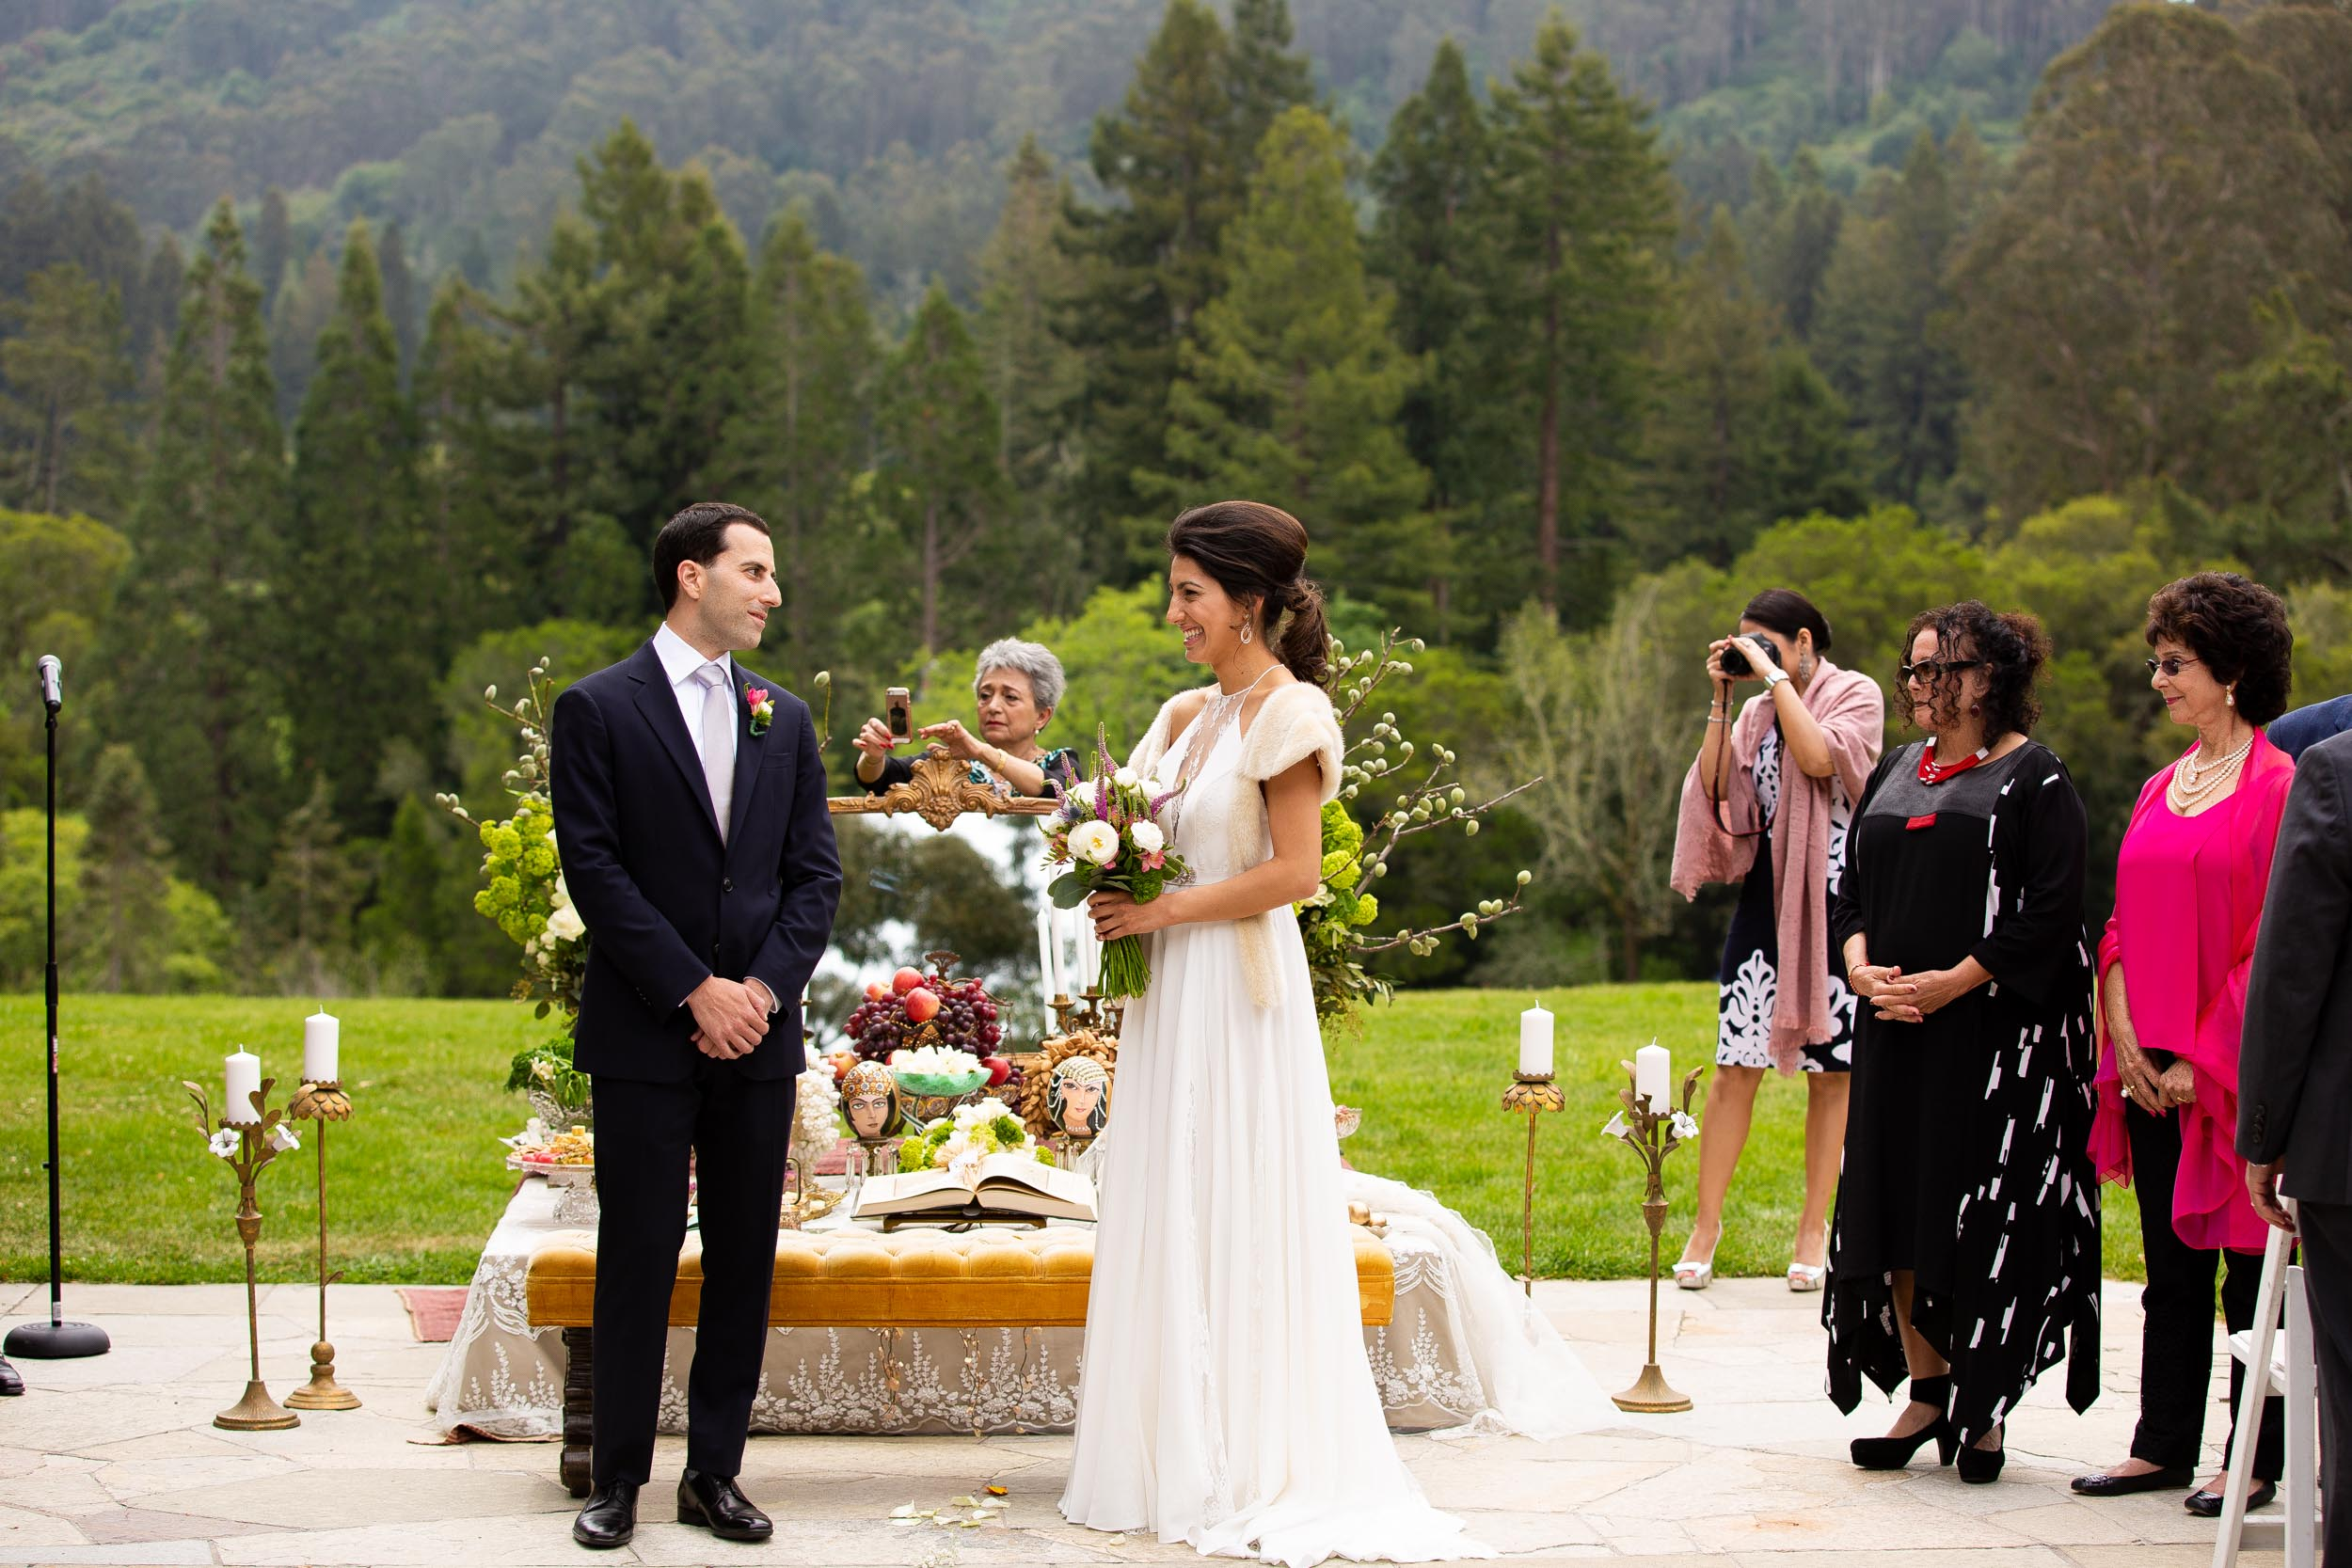 Brazilian-Room-wedding-Persian-ceremony-52.jpg